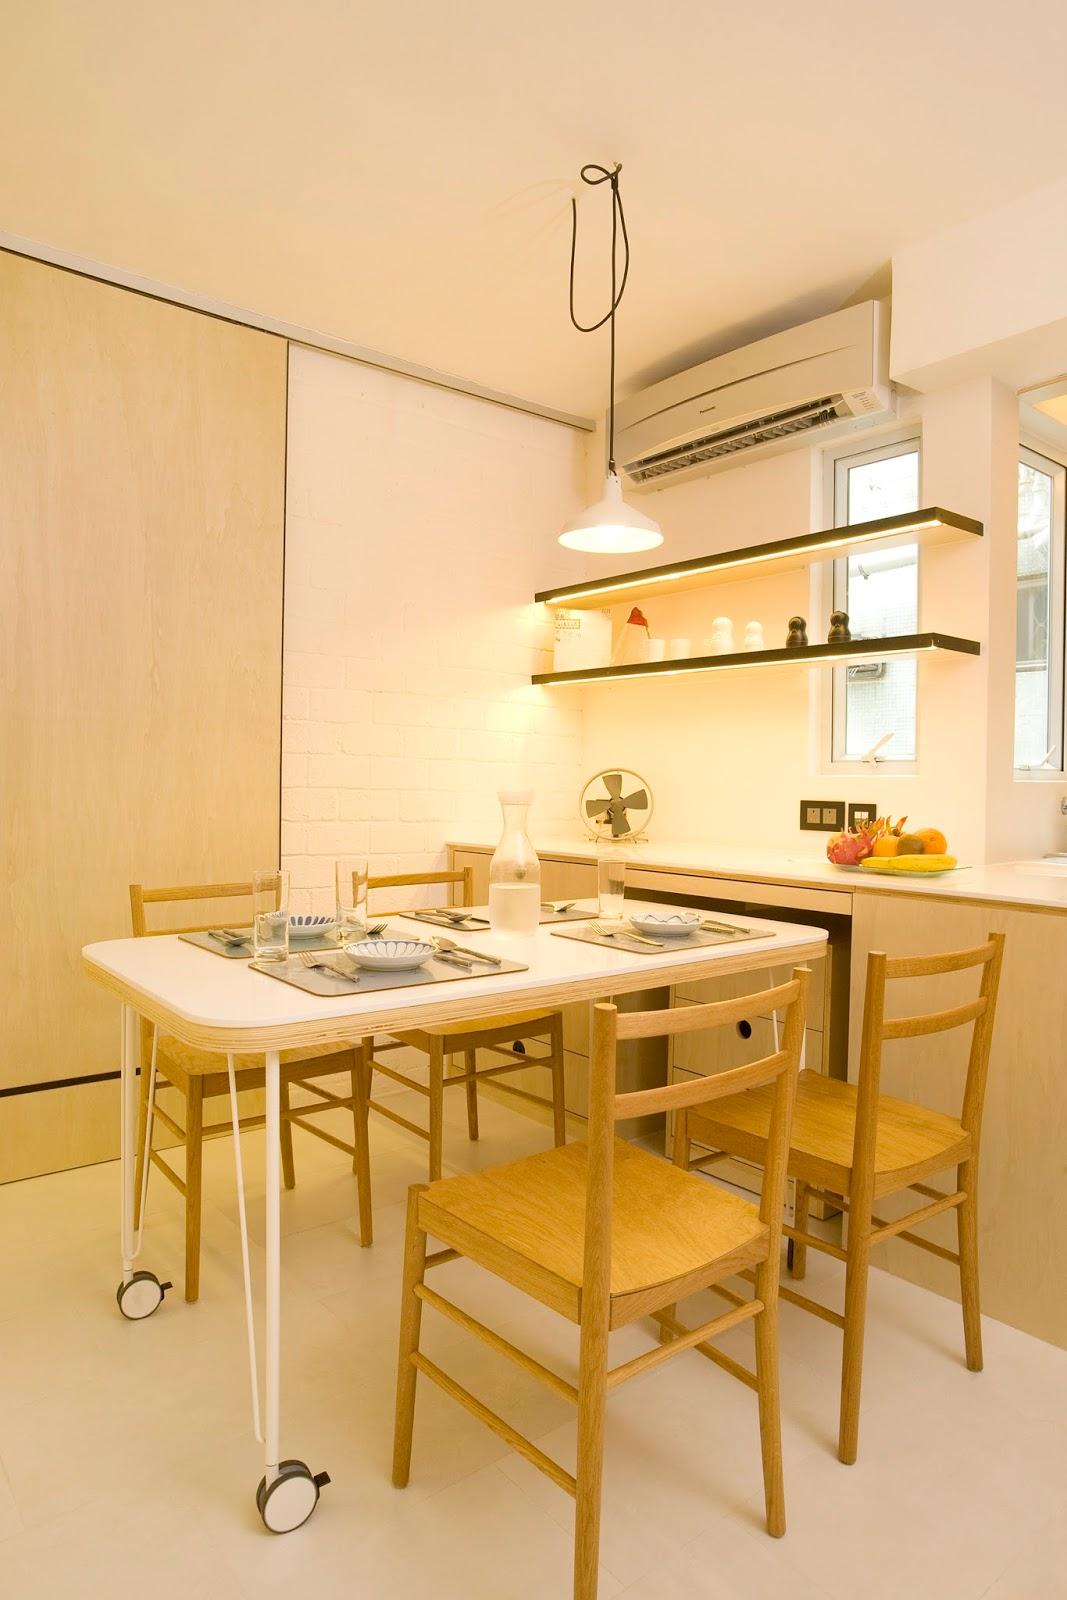 Hong Kong Interior Design Tips & Ideas | Clifton Leung: 6 WAYS TO ...